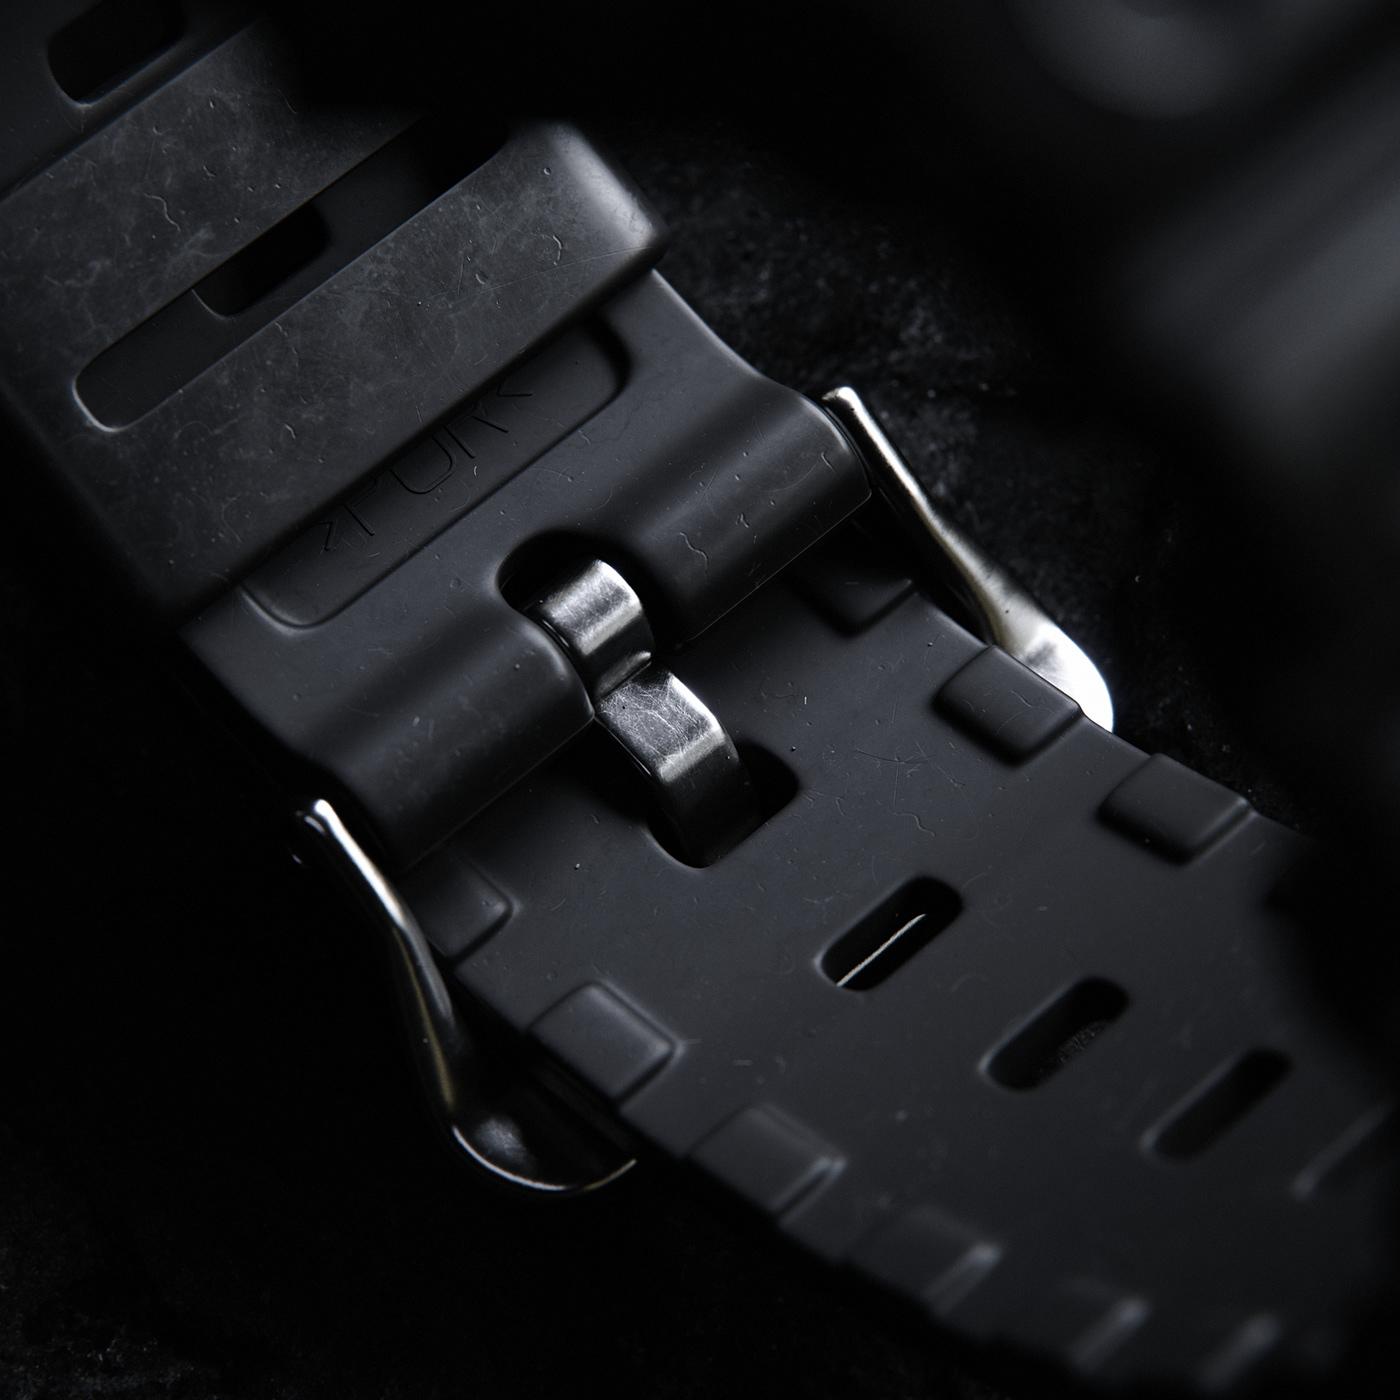 3D 3dsmax Casio CGI corona design G-Shock Photography  watch product